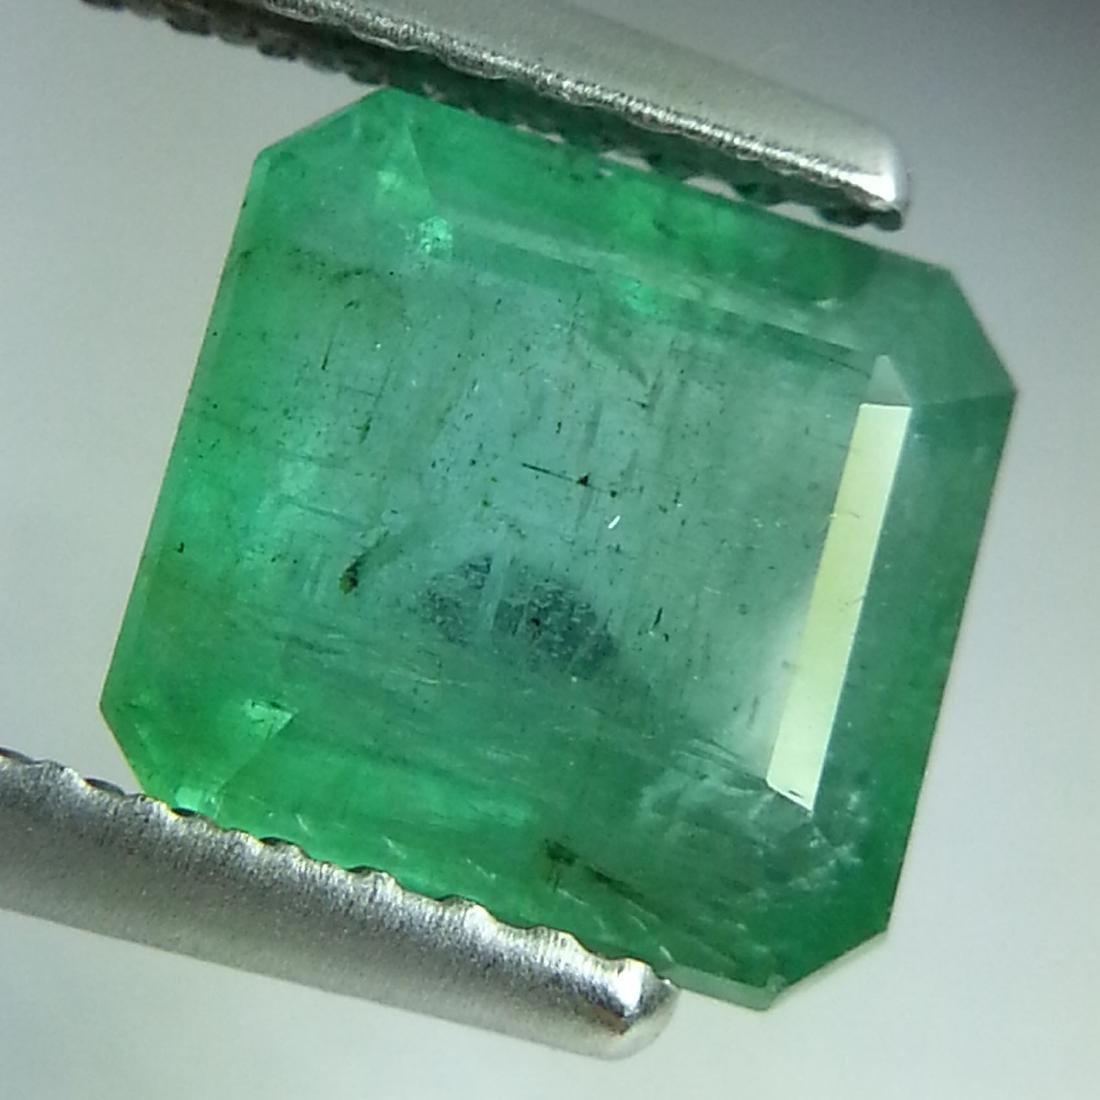 Emerald - 2.31 ct - 2